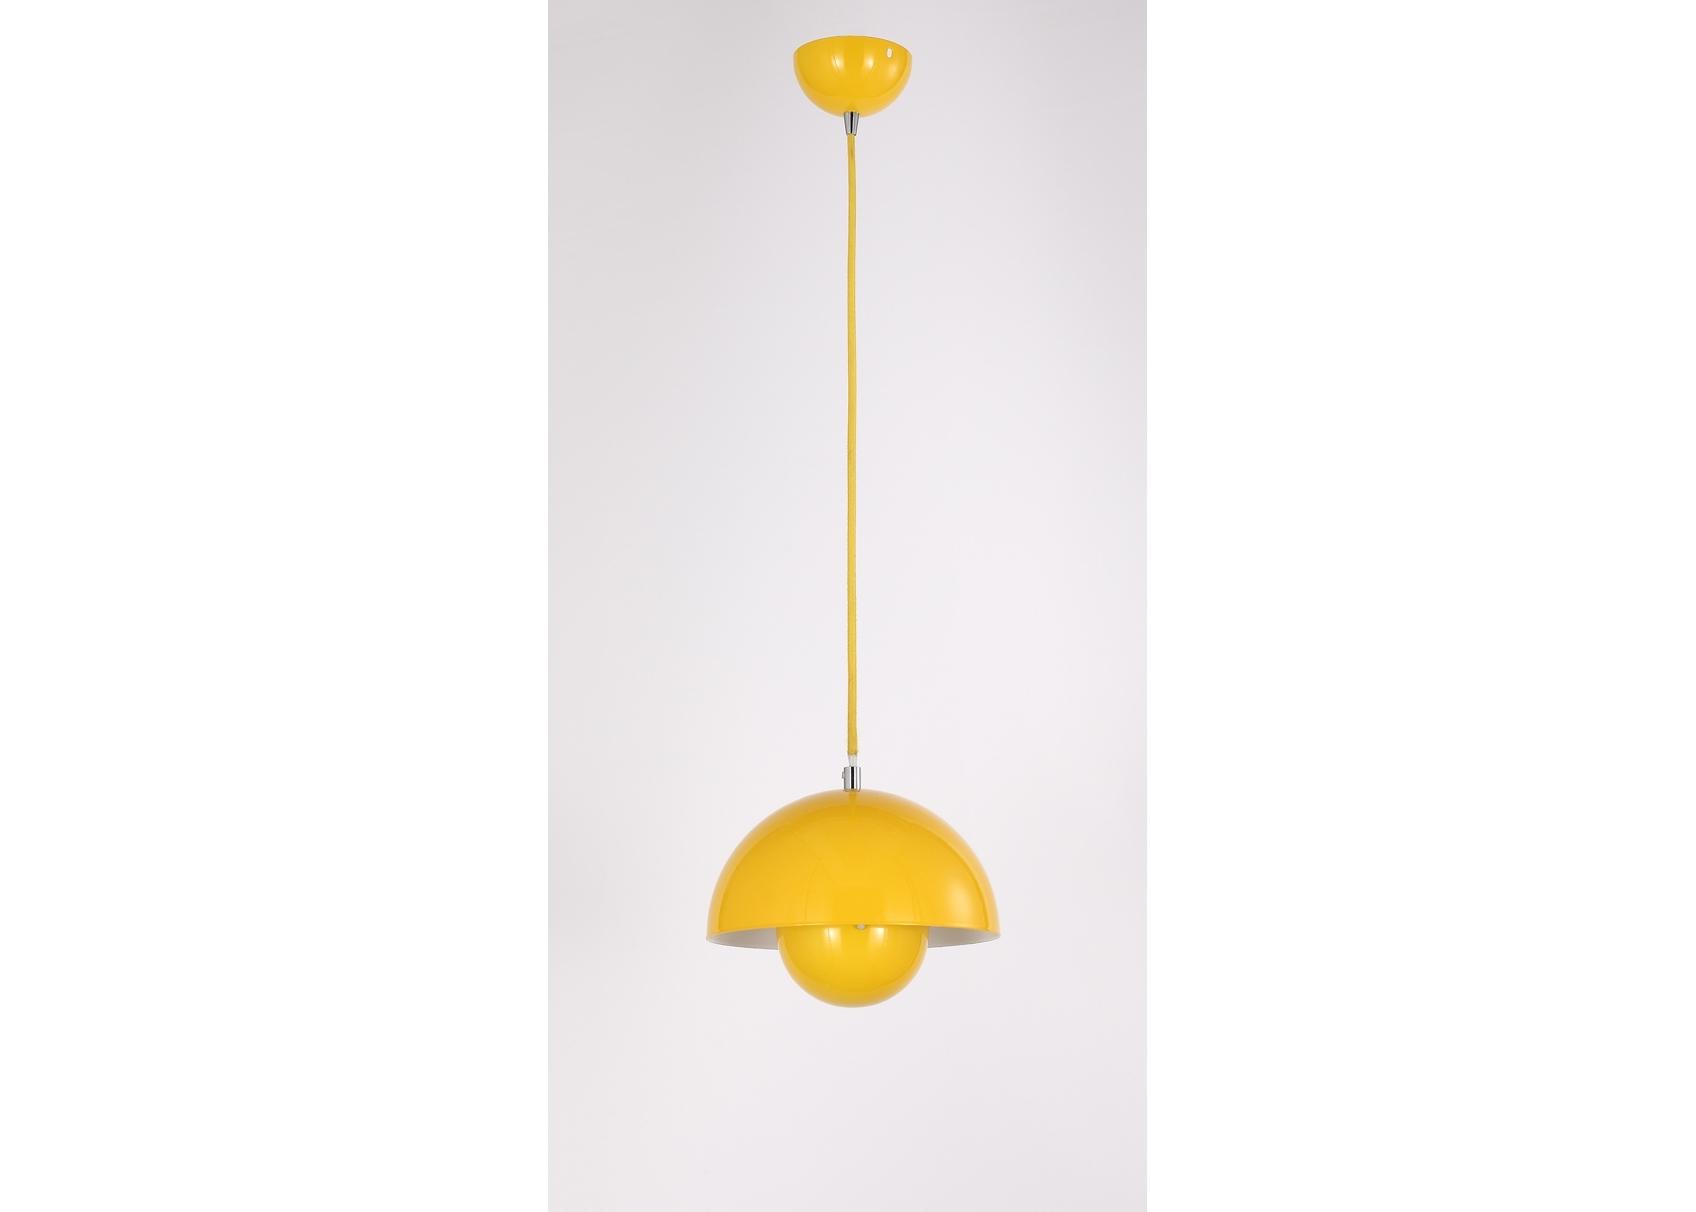 Подвесной светильник NarniПодвесные светильники<br>Материал: Металл<br>Design by Ketty Smith USA<br>Источник света: 1*60W (E27)<br>Особенности:<br>  а) Алюминий<br>  b) Цвет Yellow&amp;amp;nbsp;<br><br>Material: Металл<br>Высота см: 17.6